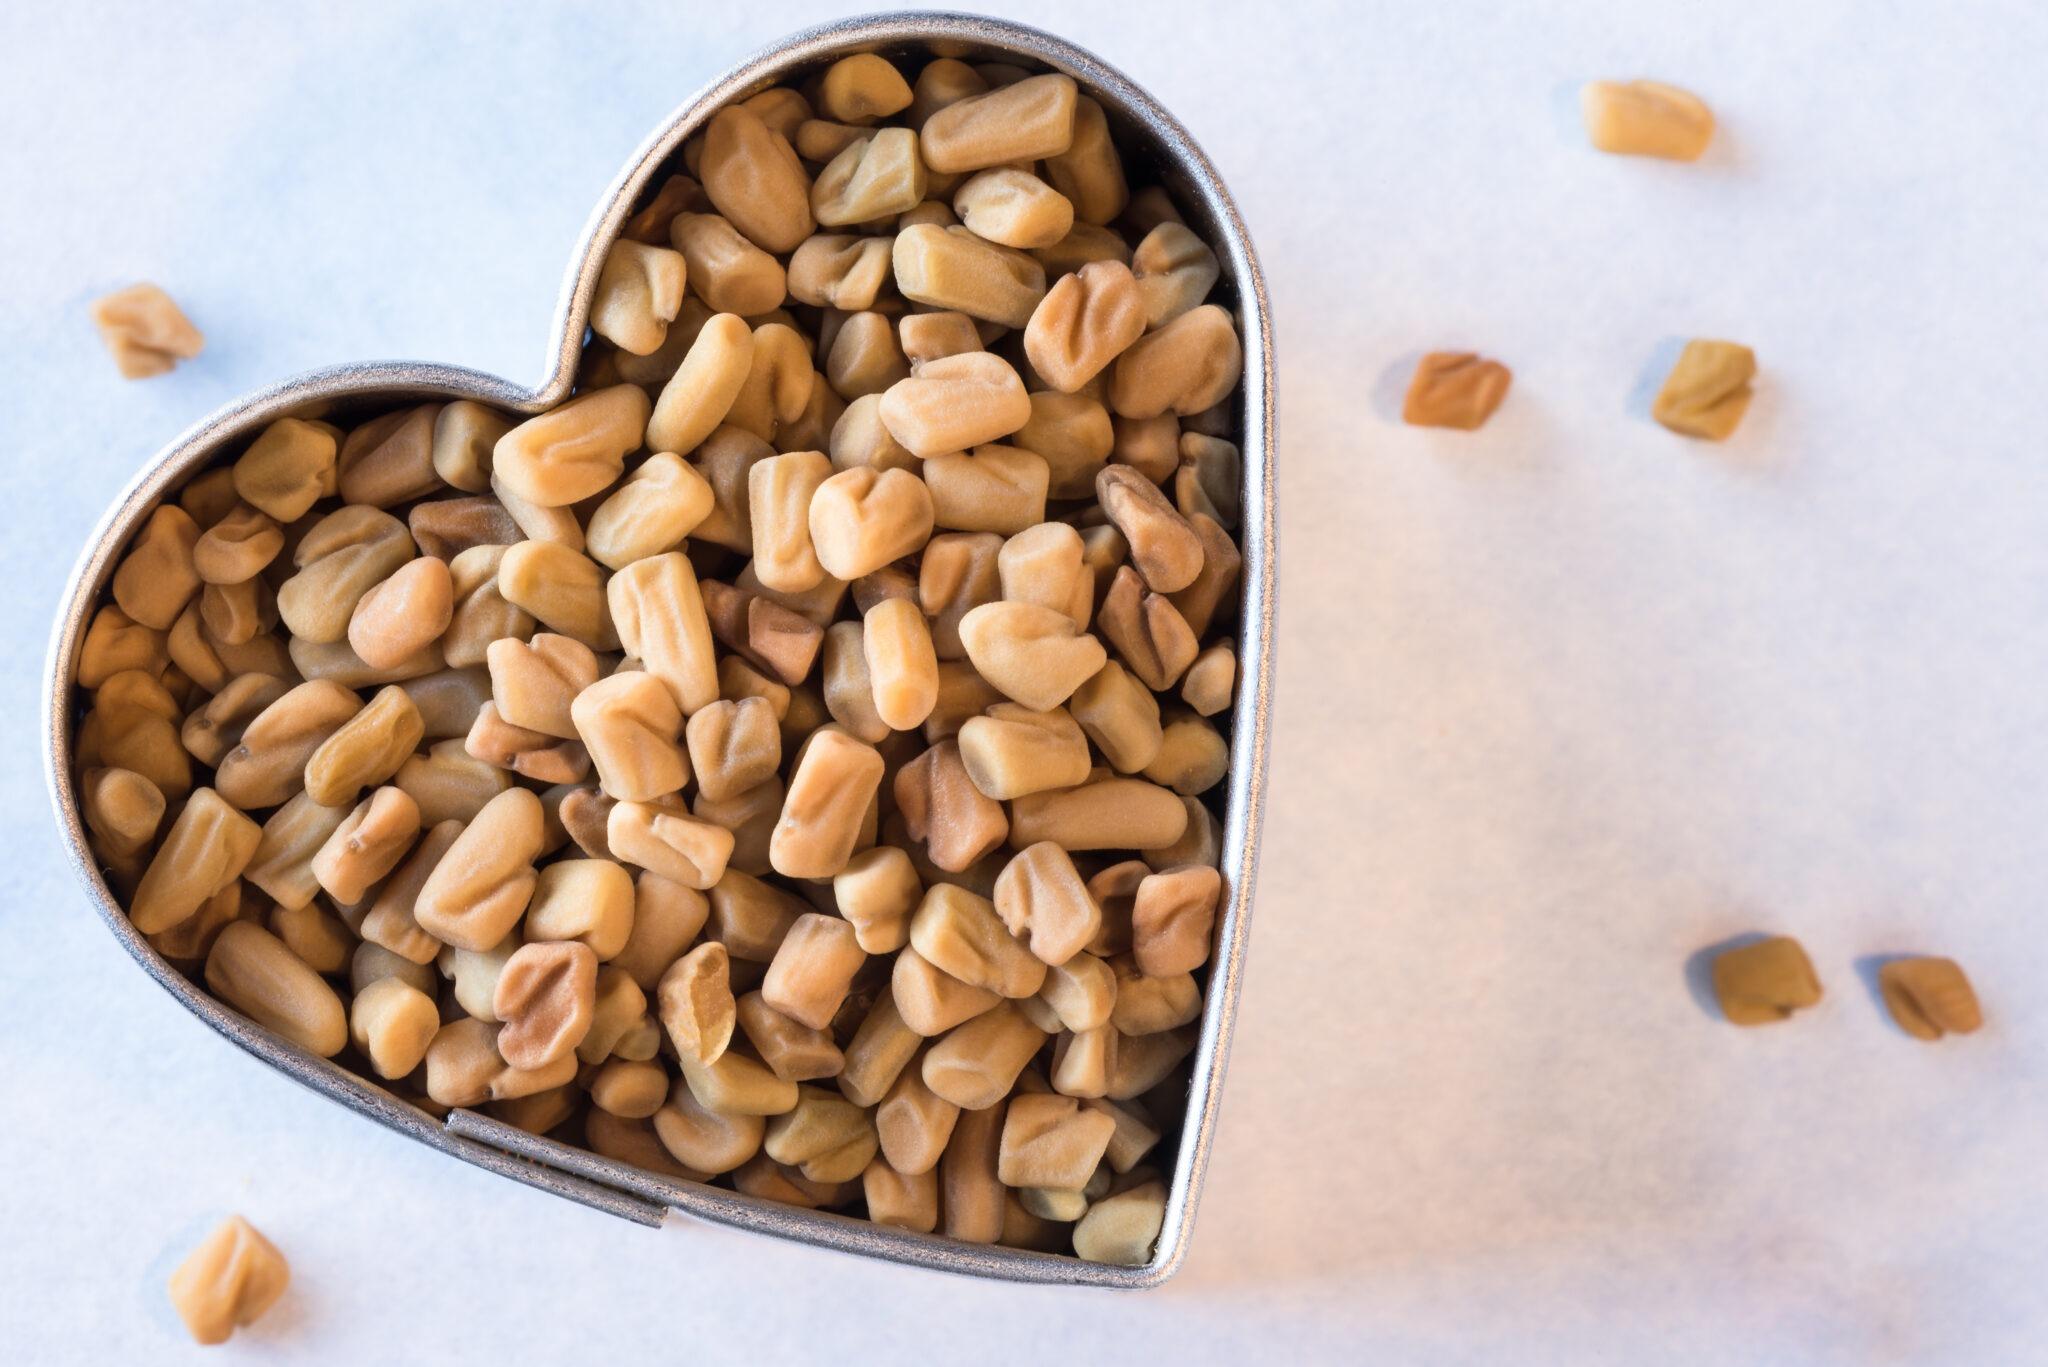 Fenugreek seeds benefits